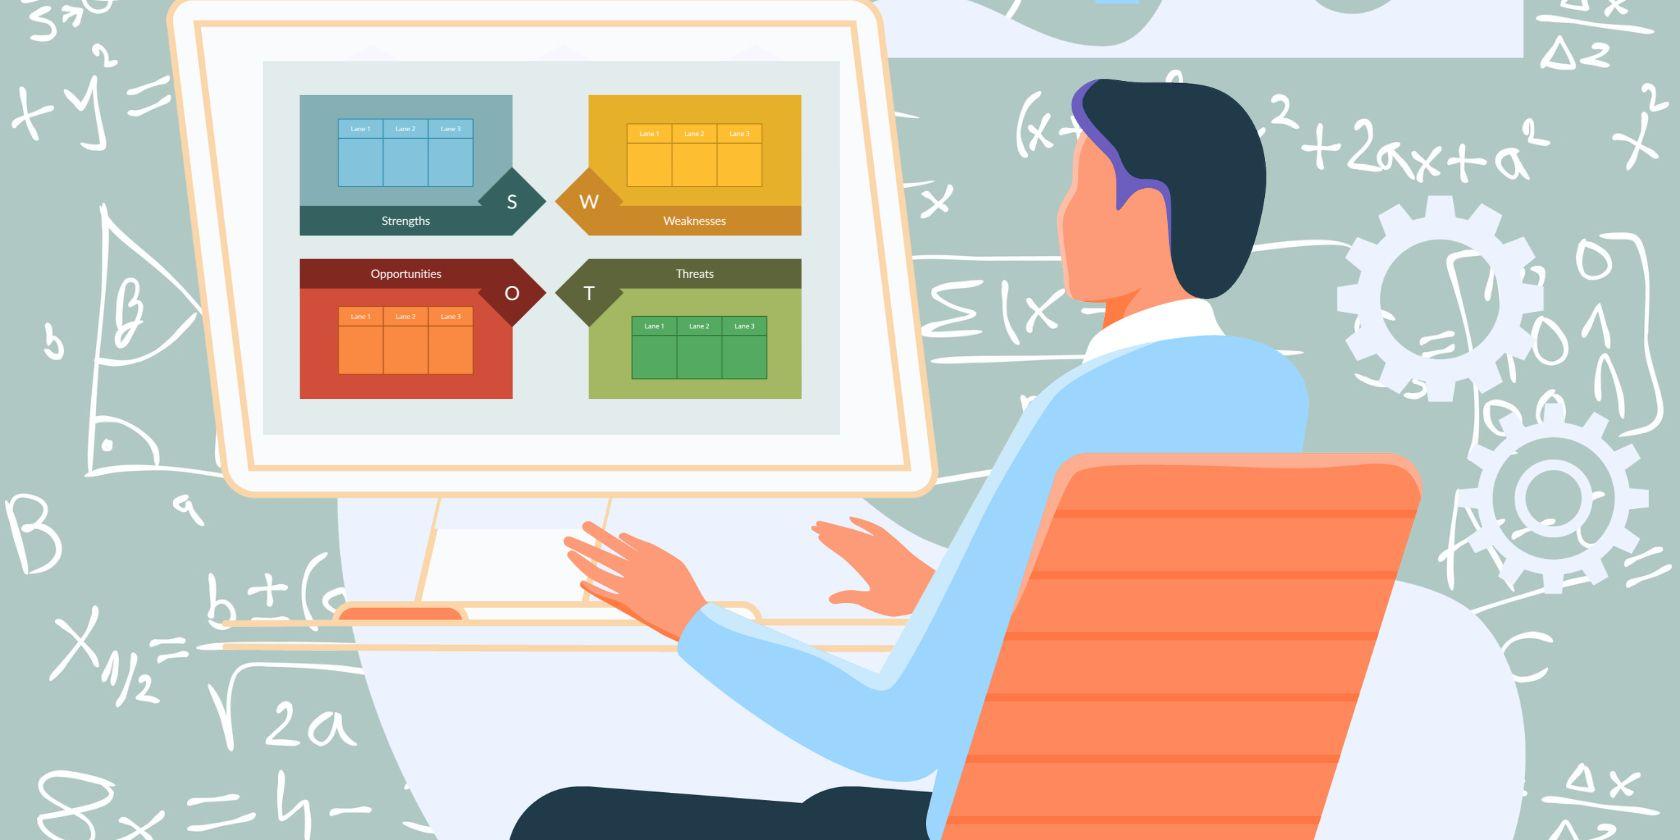 SWOT Analysis, Freelance News, Freelancing Resources, Freelancing Tips, Freelancing Skills, Freeelance Gig